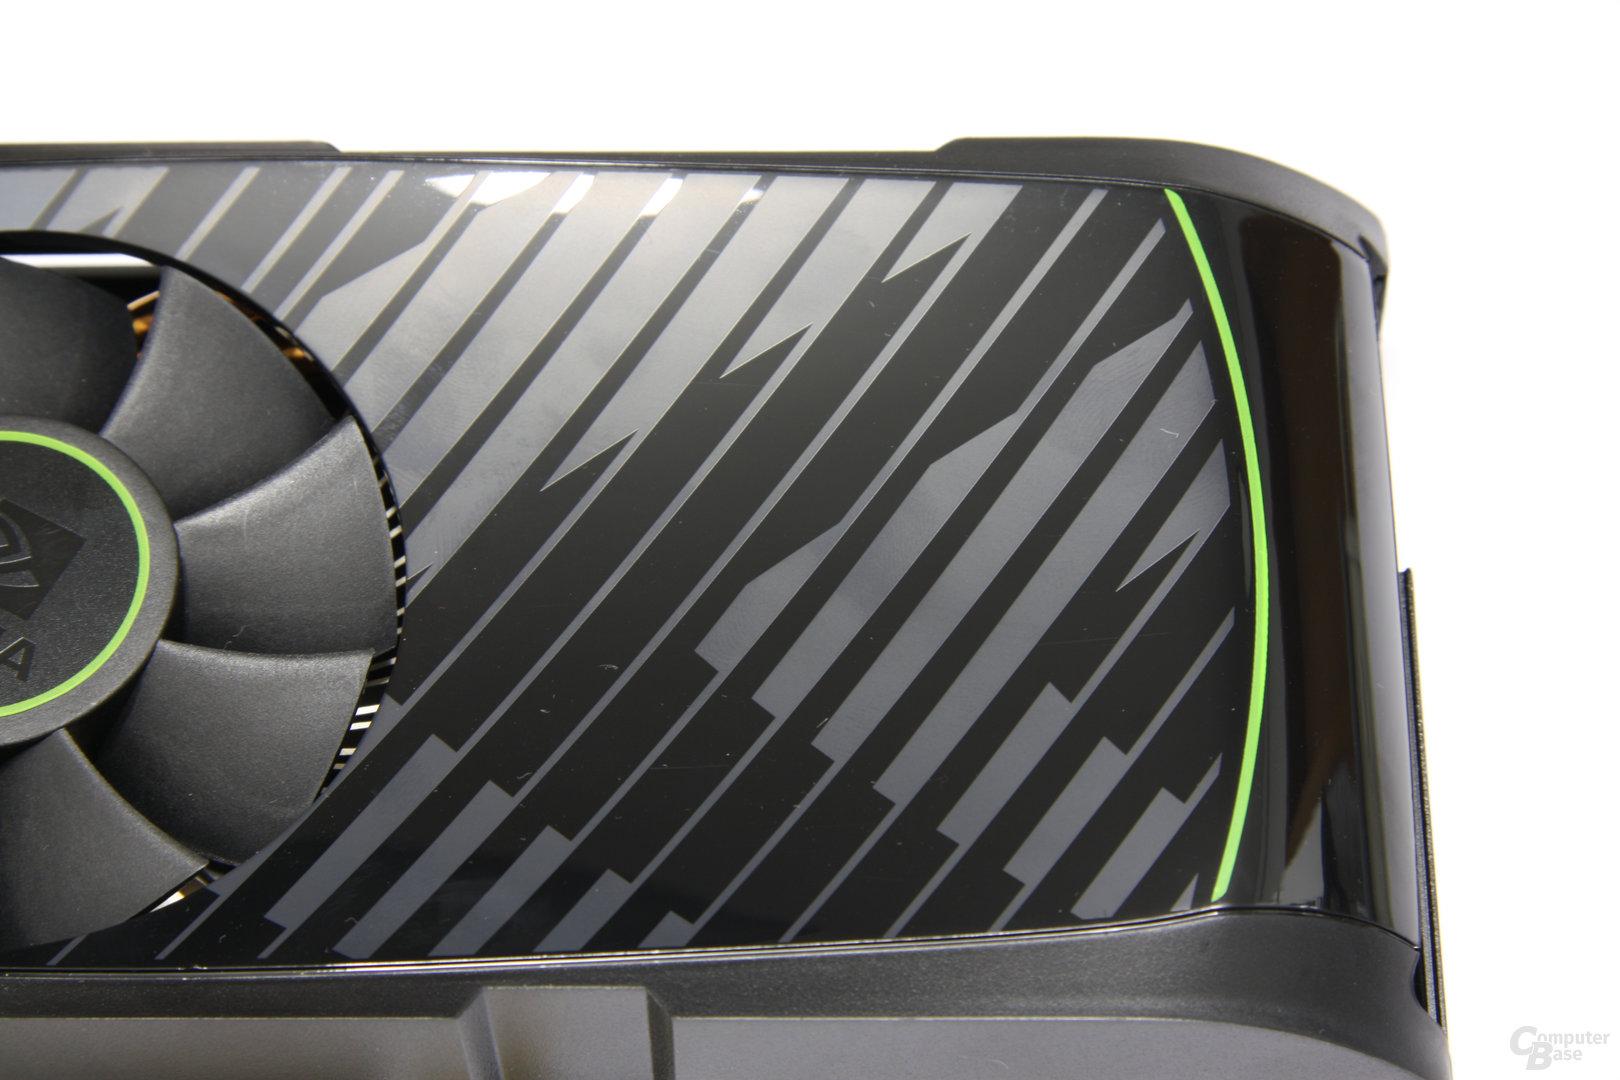 GeForce GTX 560 Ti Muster